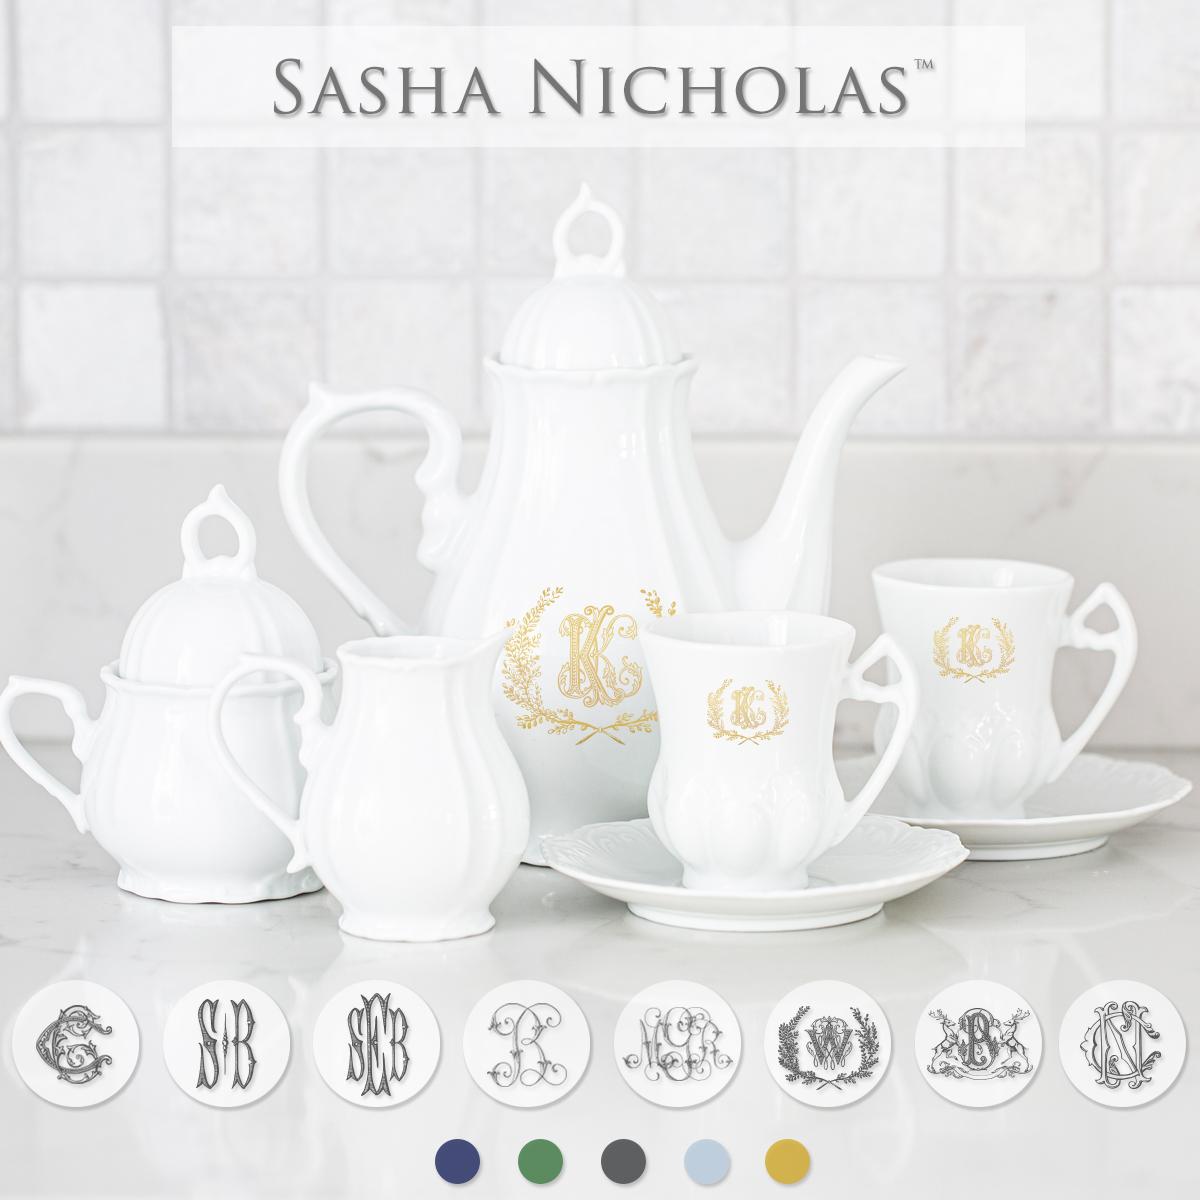 Sasha Nicholas Child's Tea Set